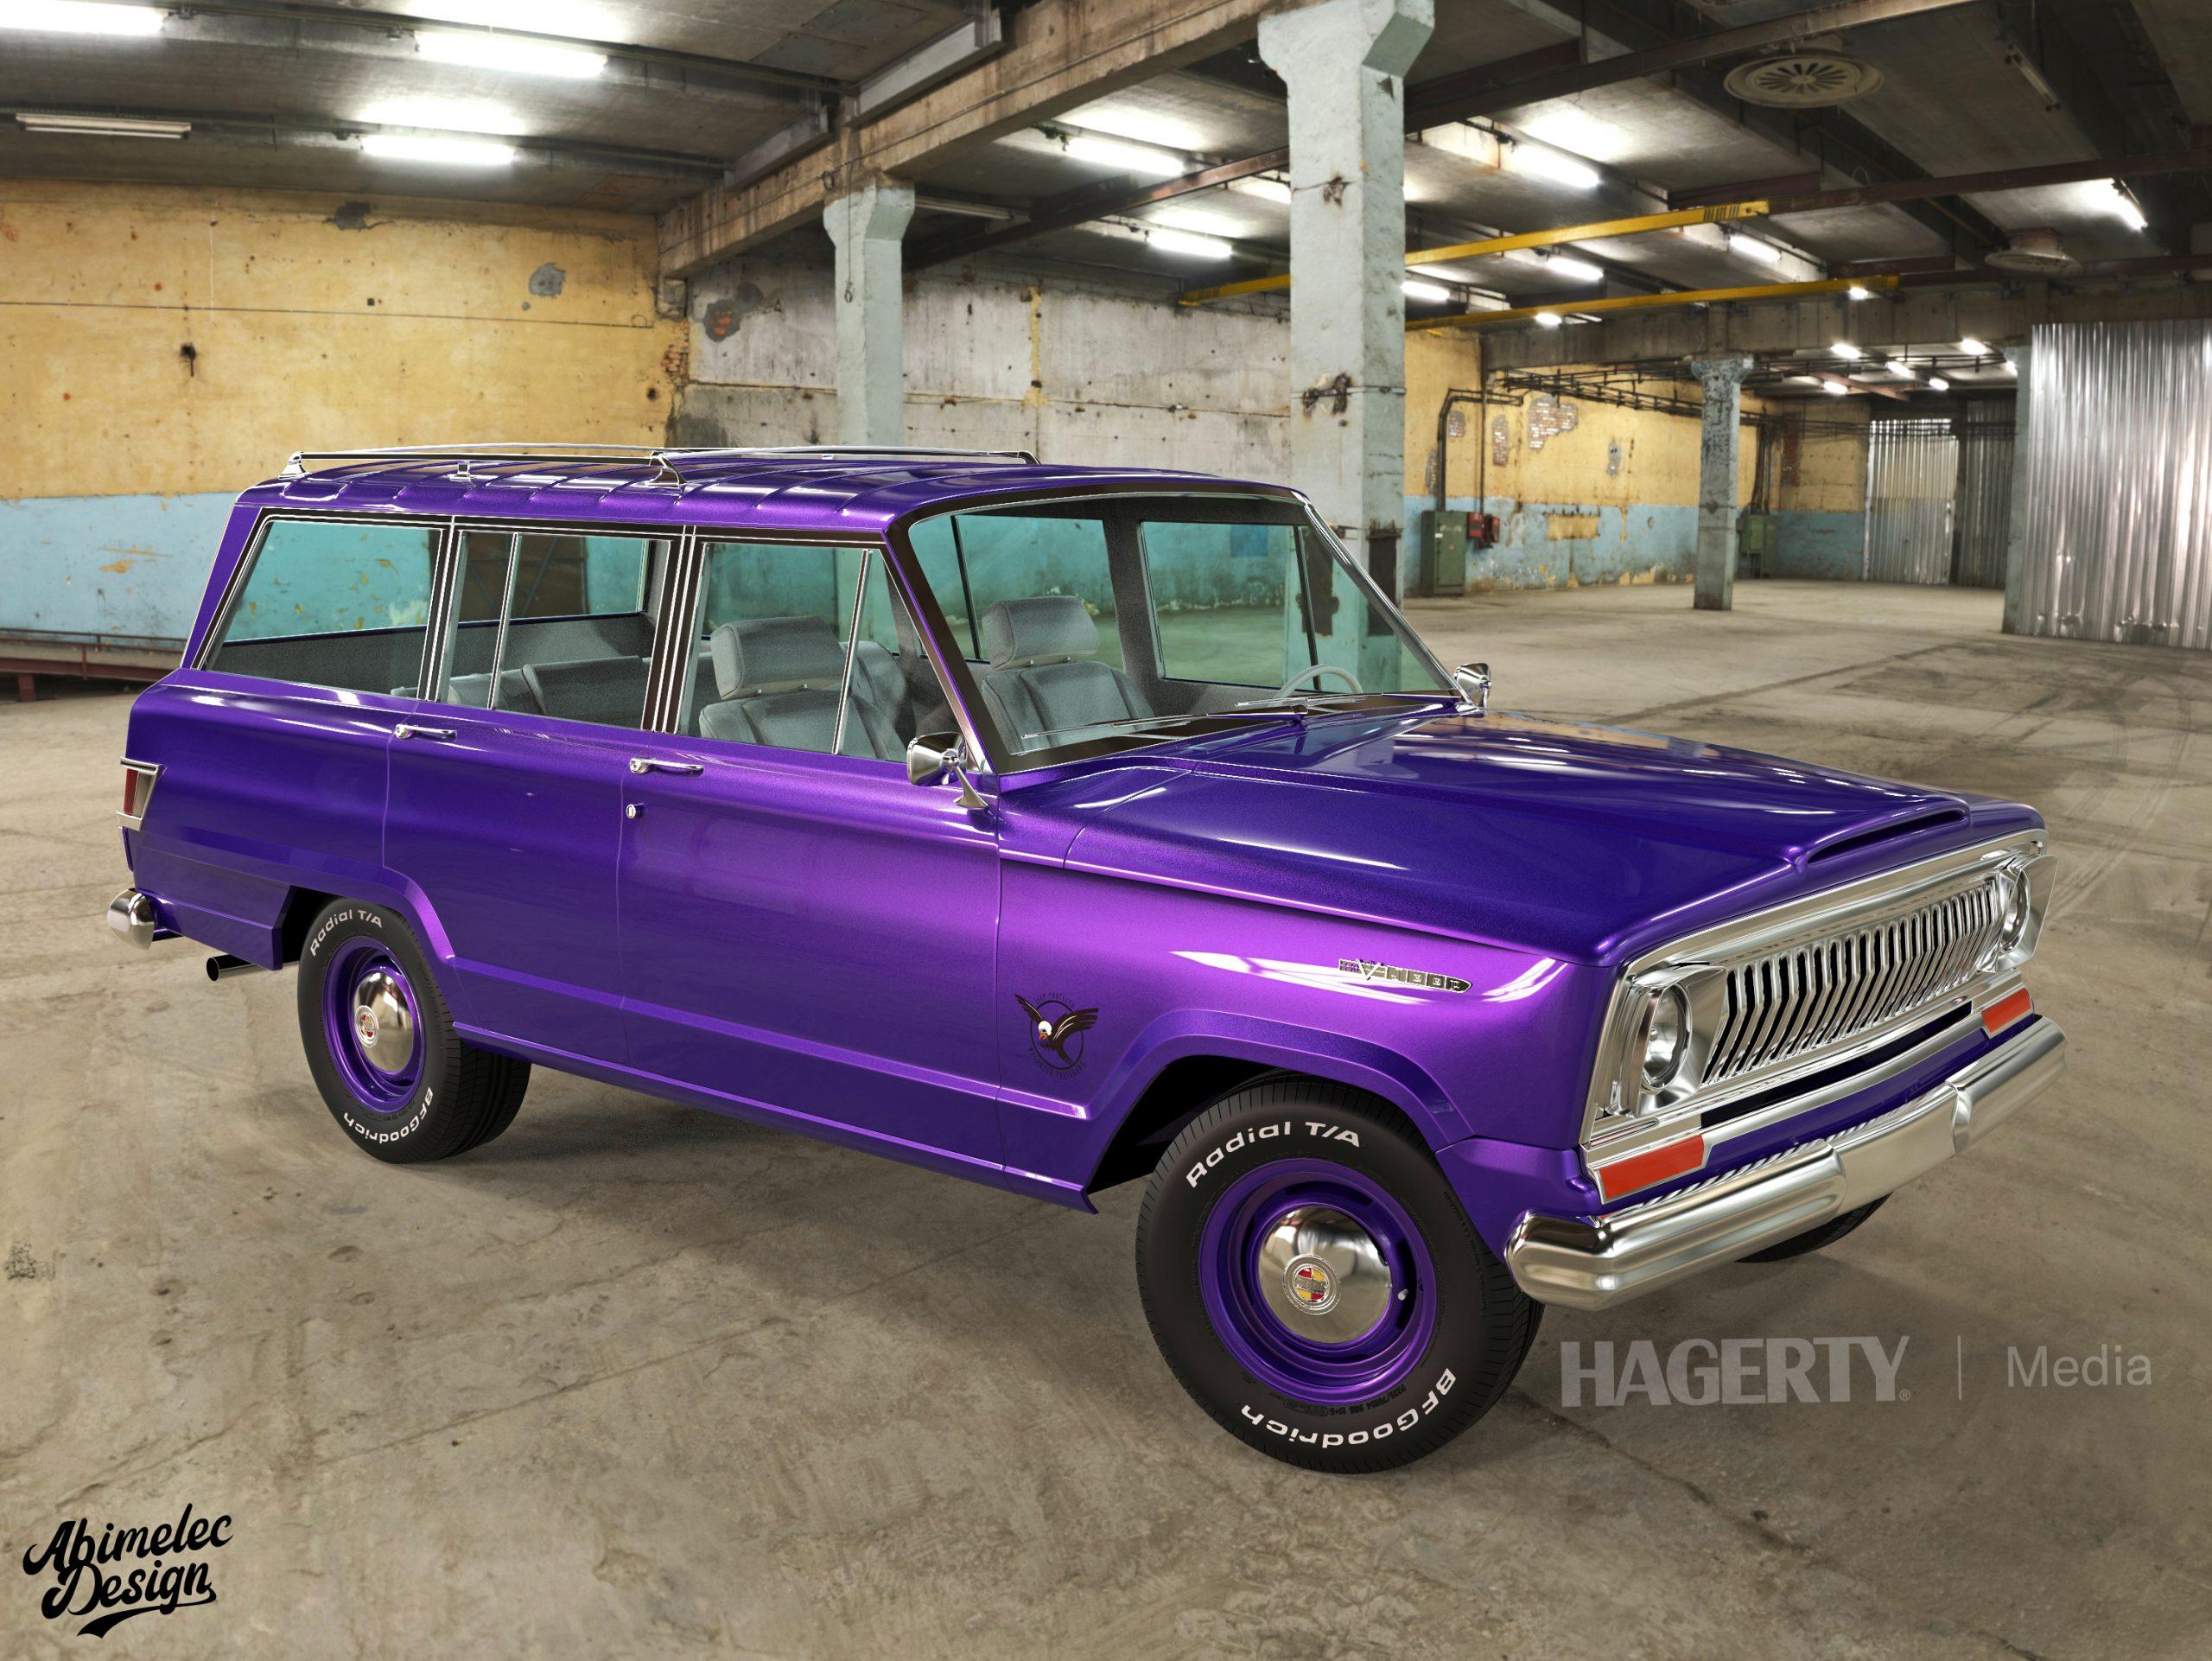 Wagoneer Trackhawk purple front three-quarter